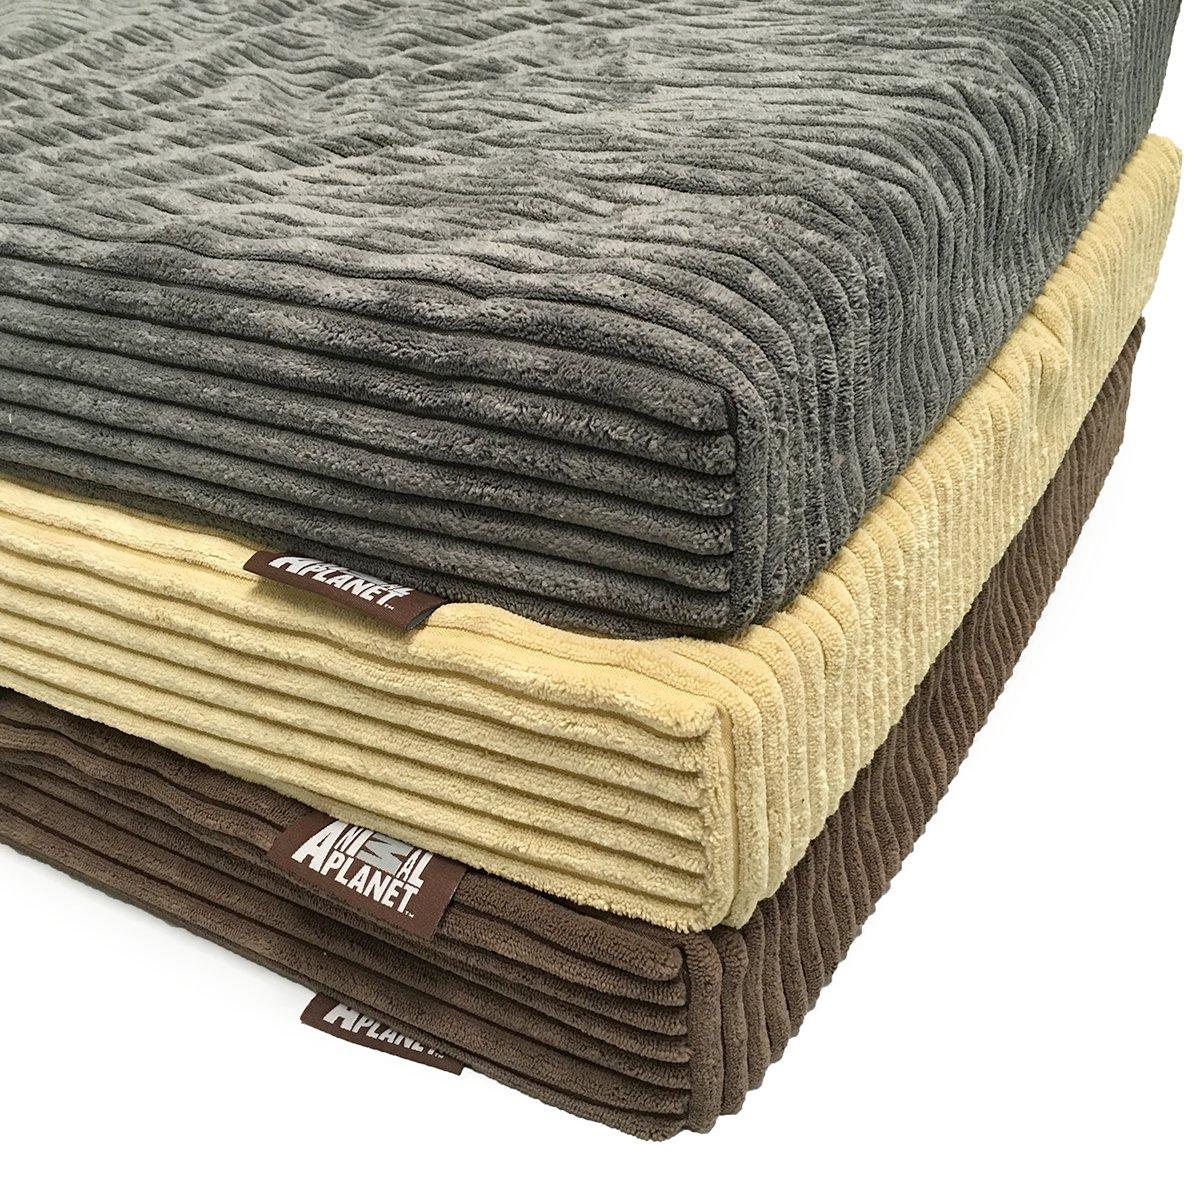 Animal Planet Orthopedic Pet Bed, 40''x26''x3'', Grey by Animal Planet (Image #5)